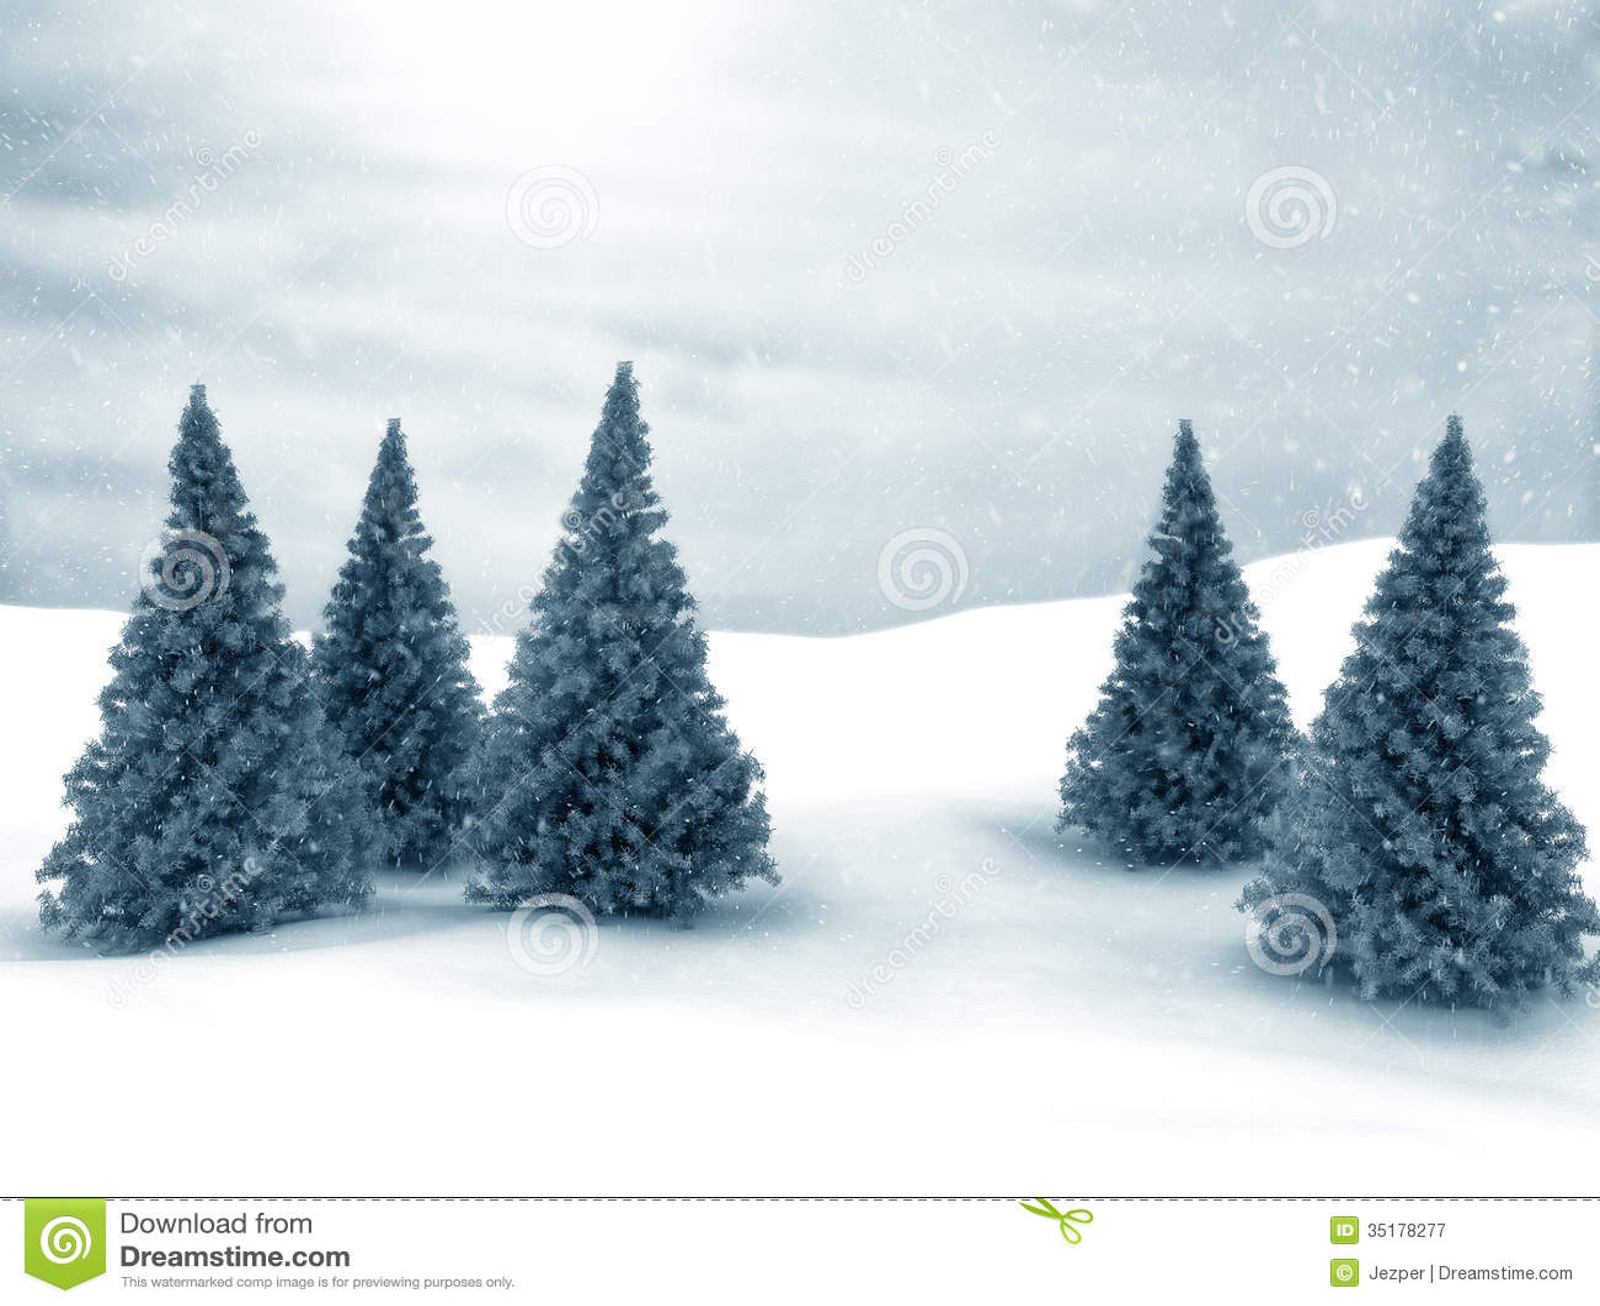 winter scene stock illustration illustration of snowstorm 35178277